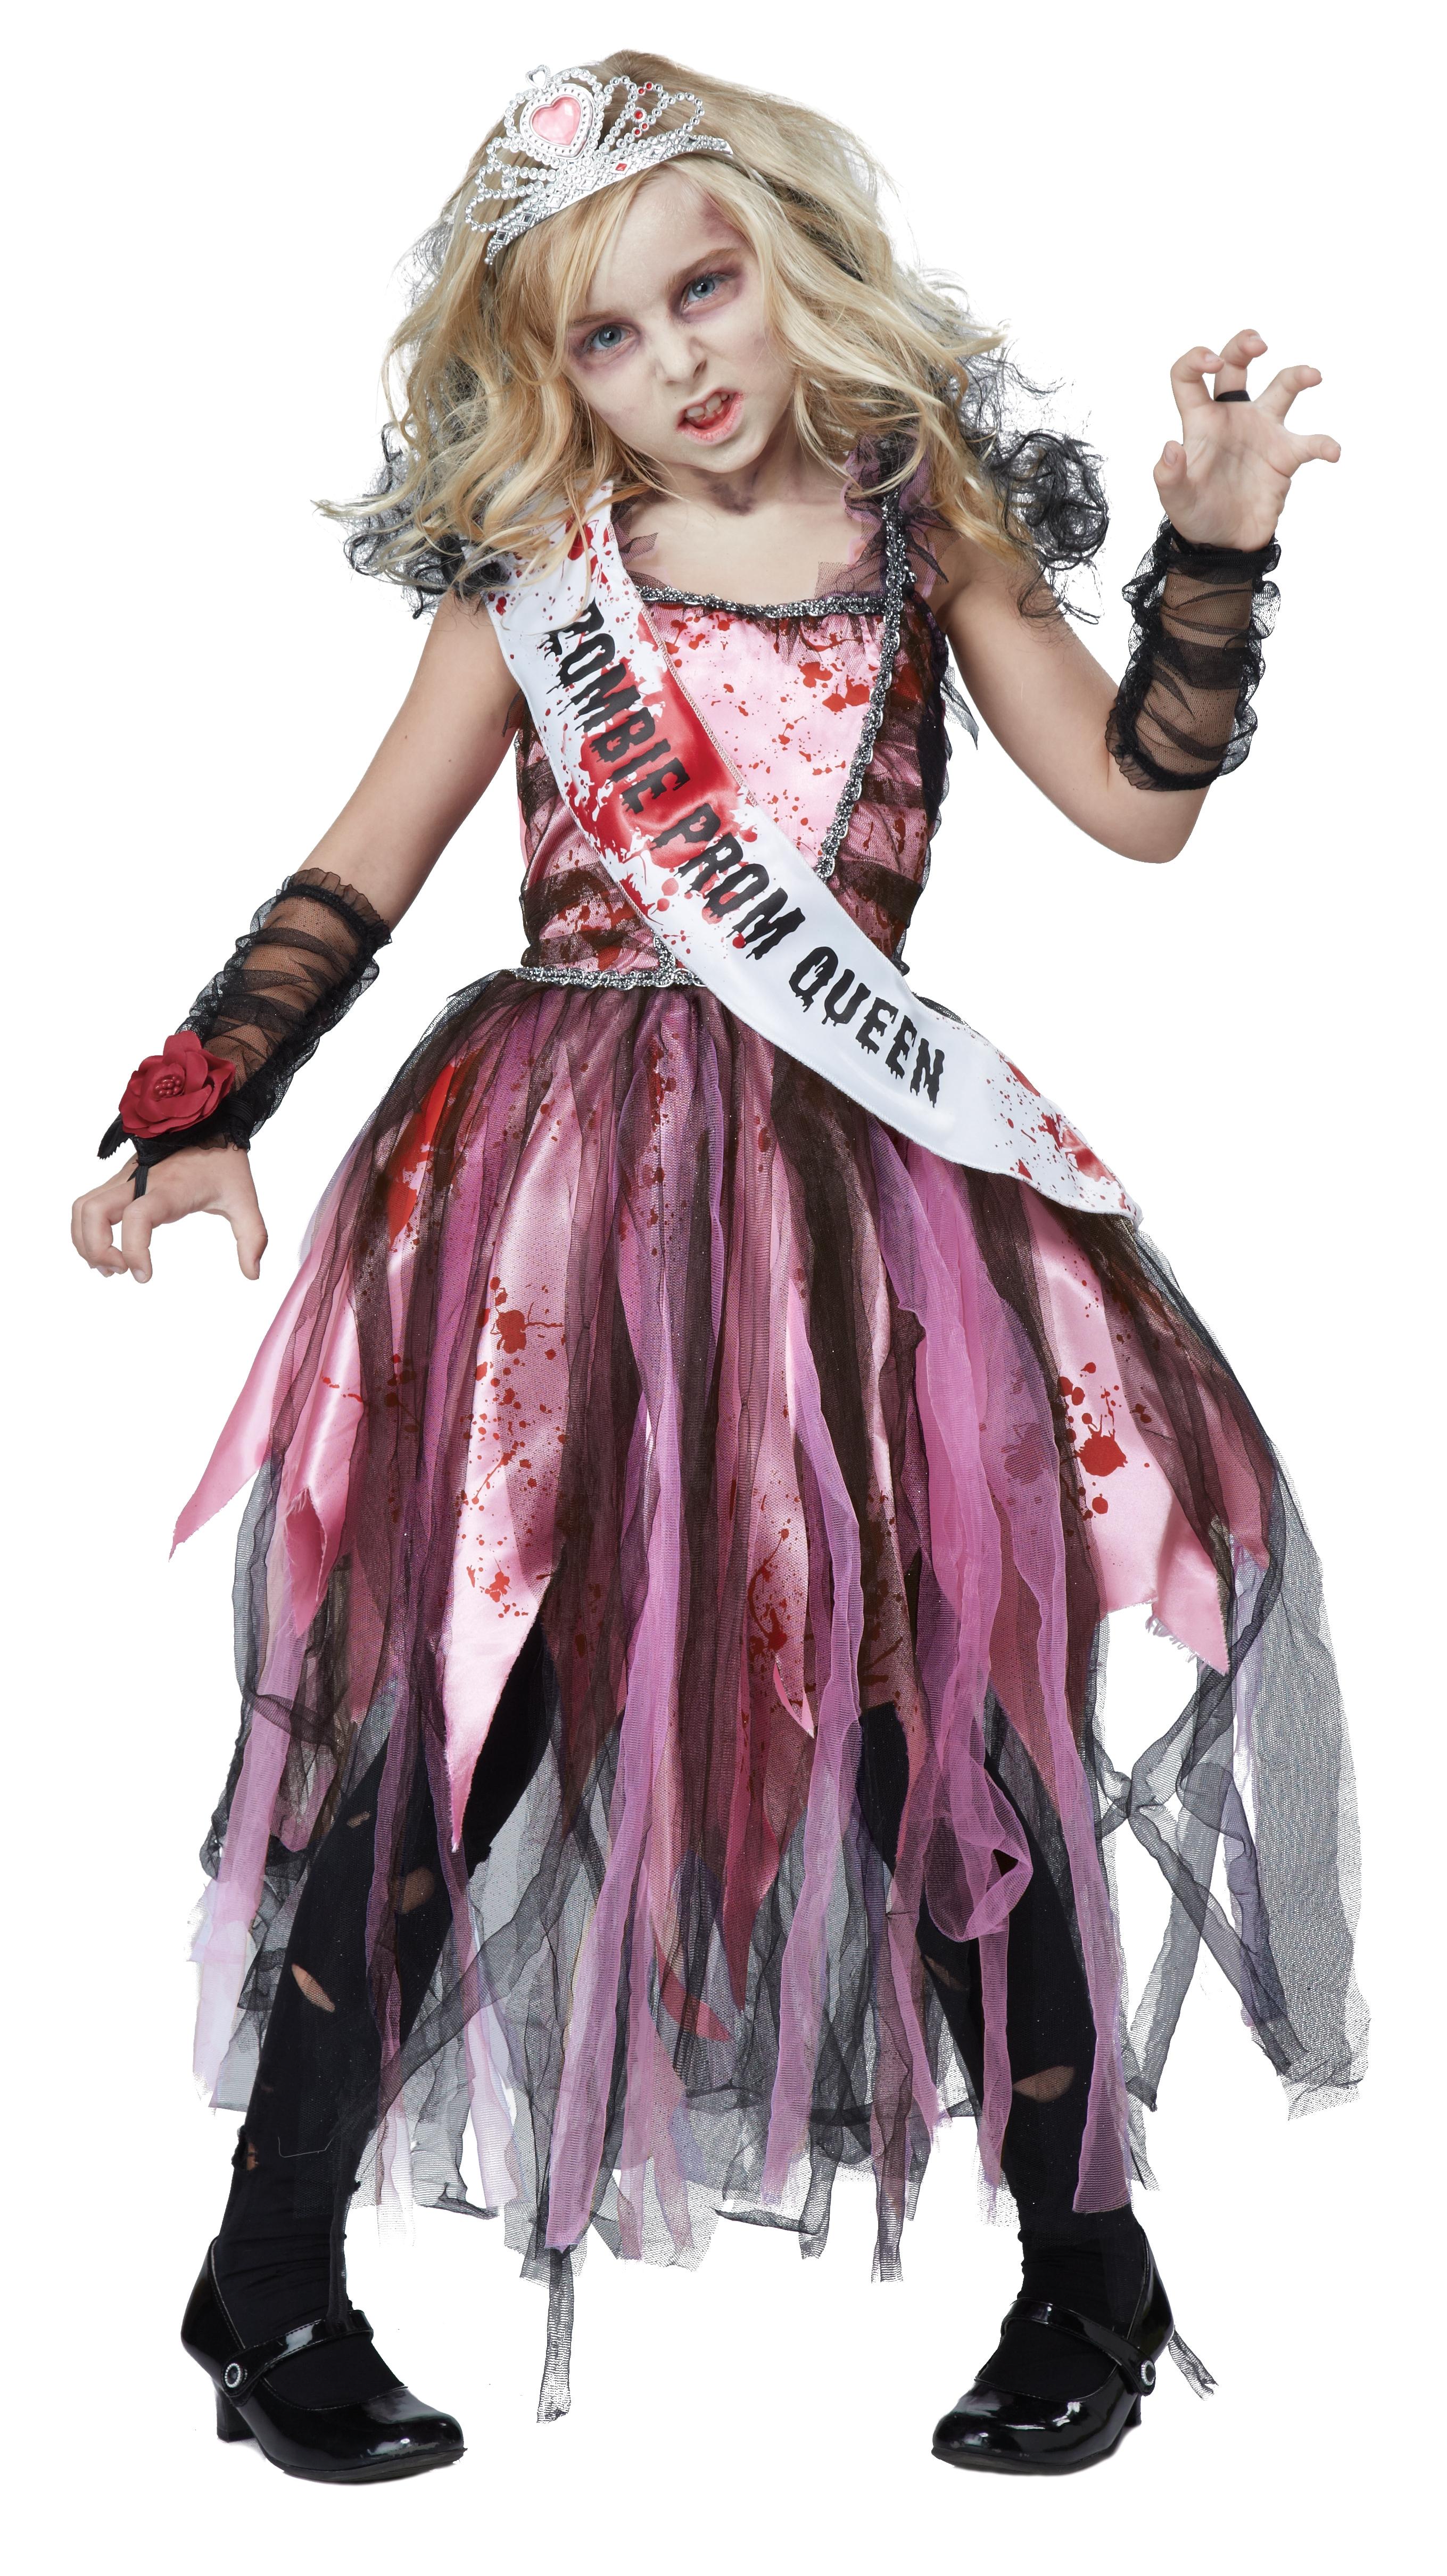 Детский костюм Зомби Выпускницы (32-34) детский костюм джульетты 32 34